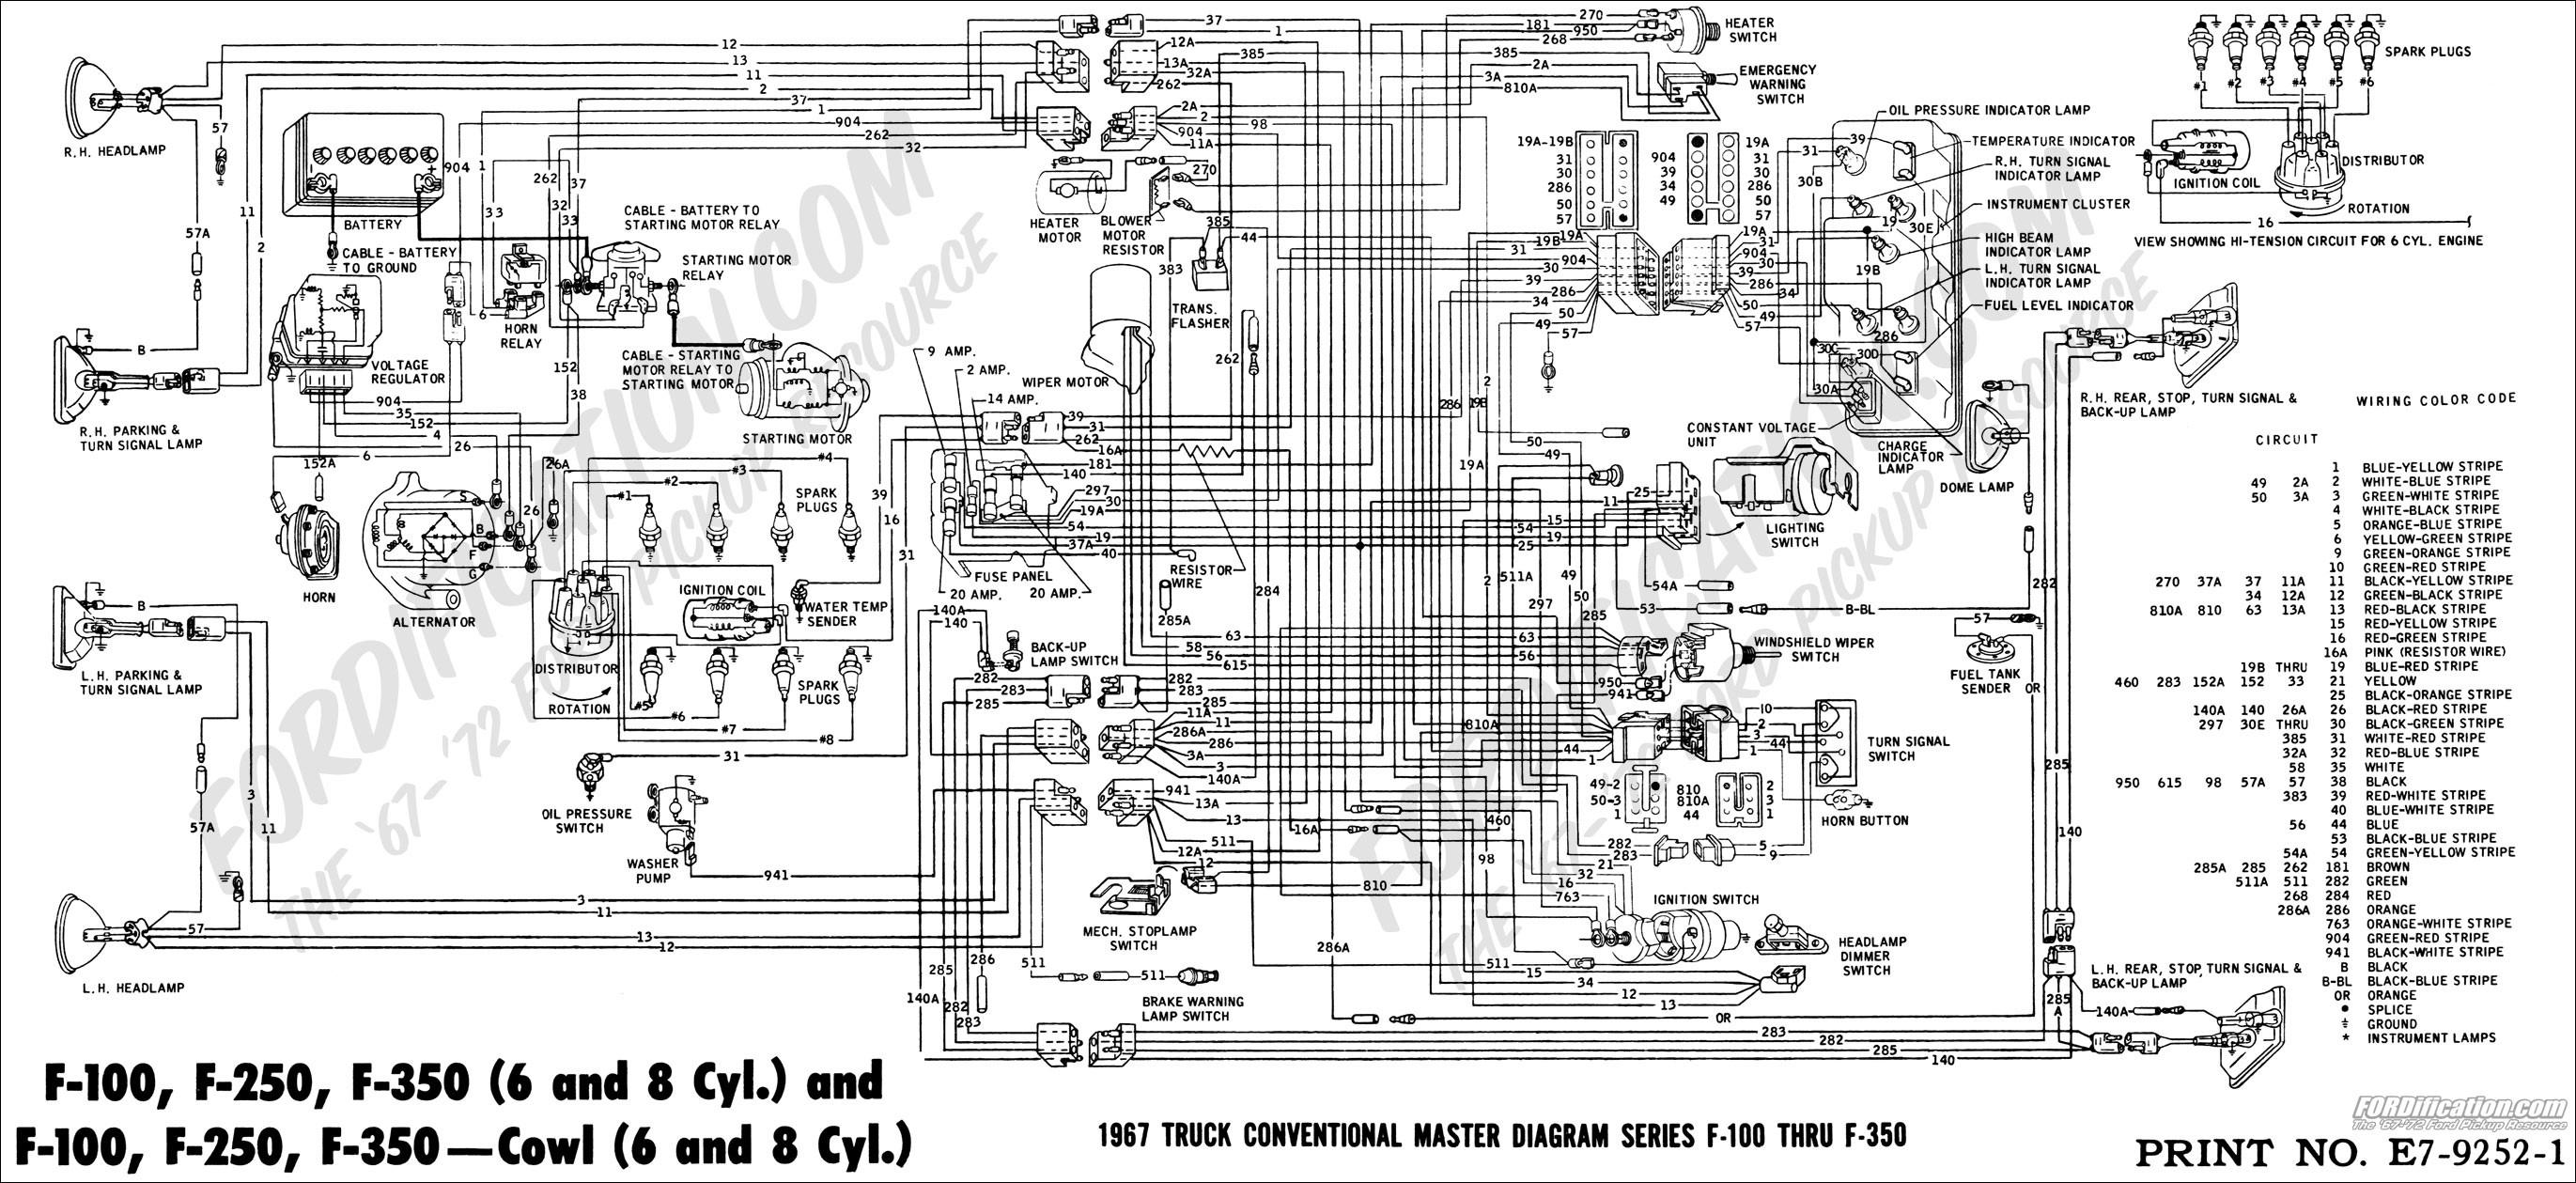 Wh 7377 F150 5 4 Engine Diagram Download Diagram